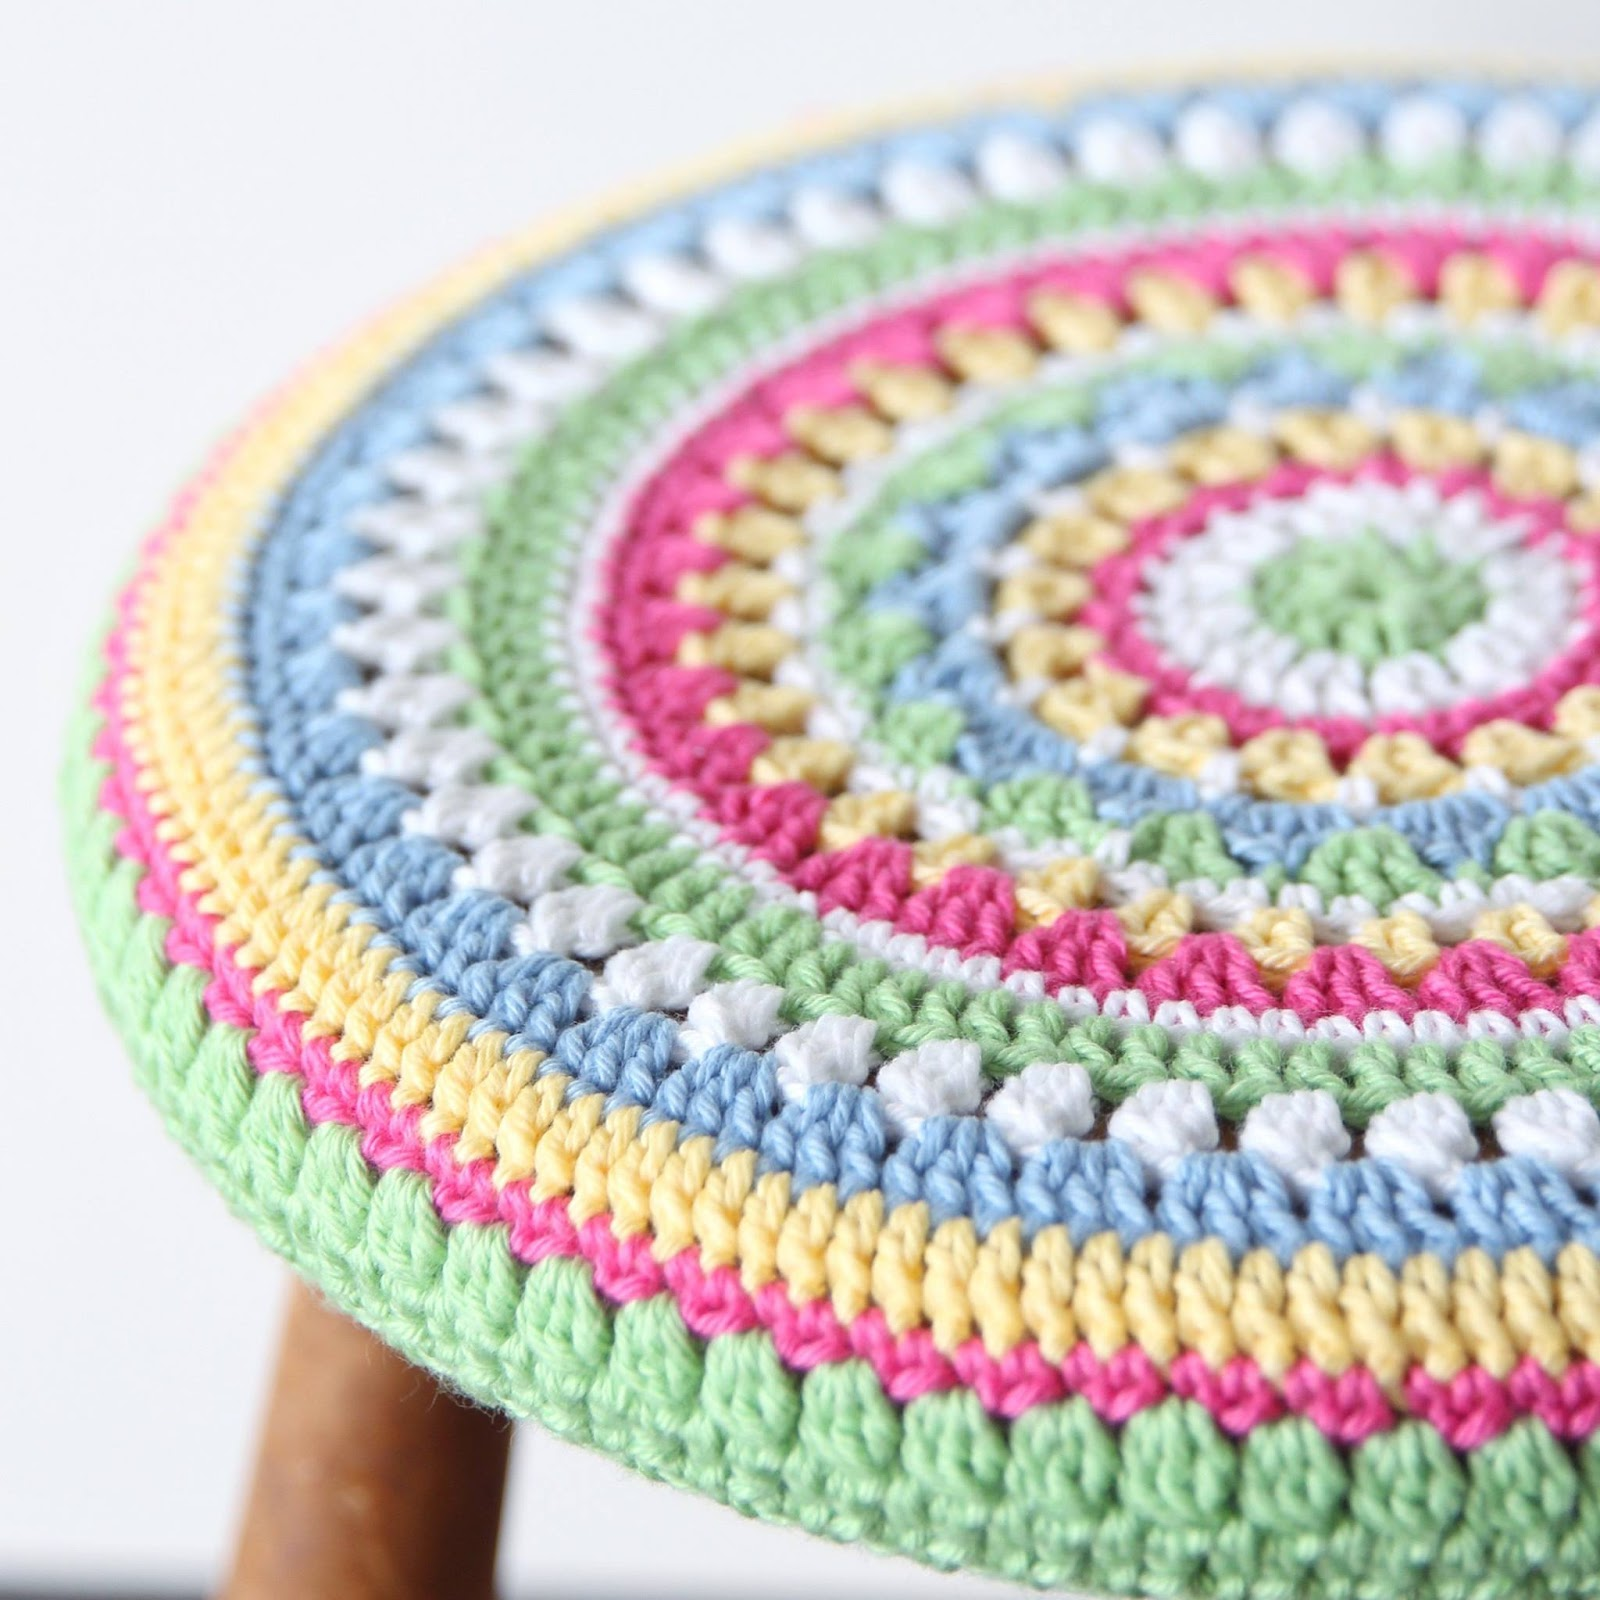 Sol de Noche {deco crochet}: Meet Mandy from RedAgape ...